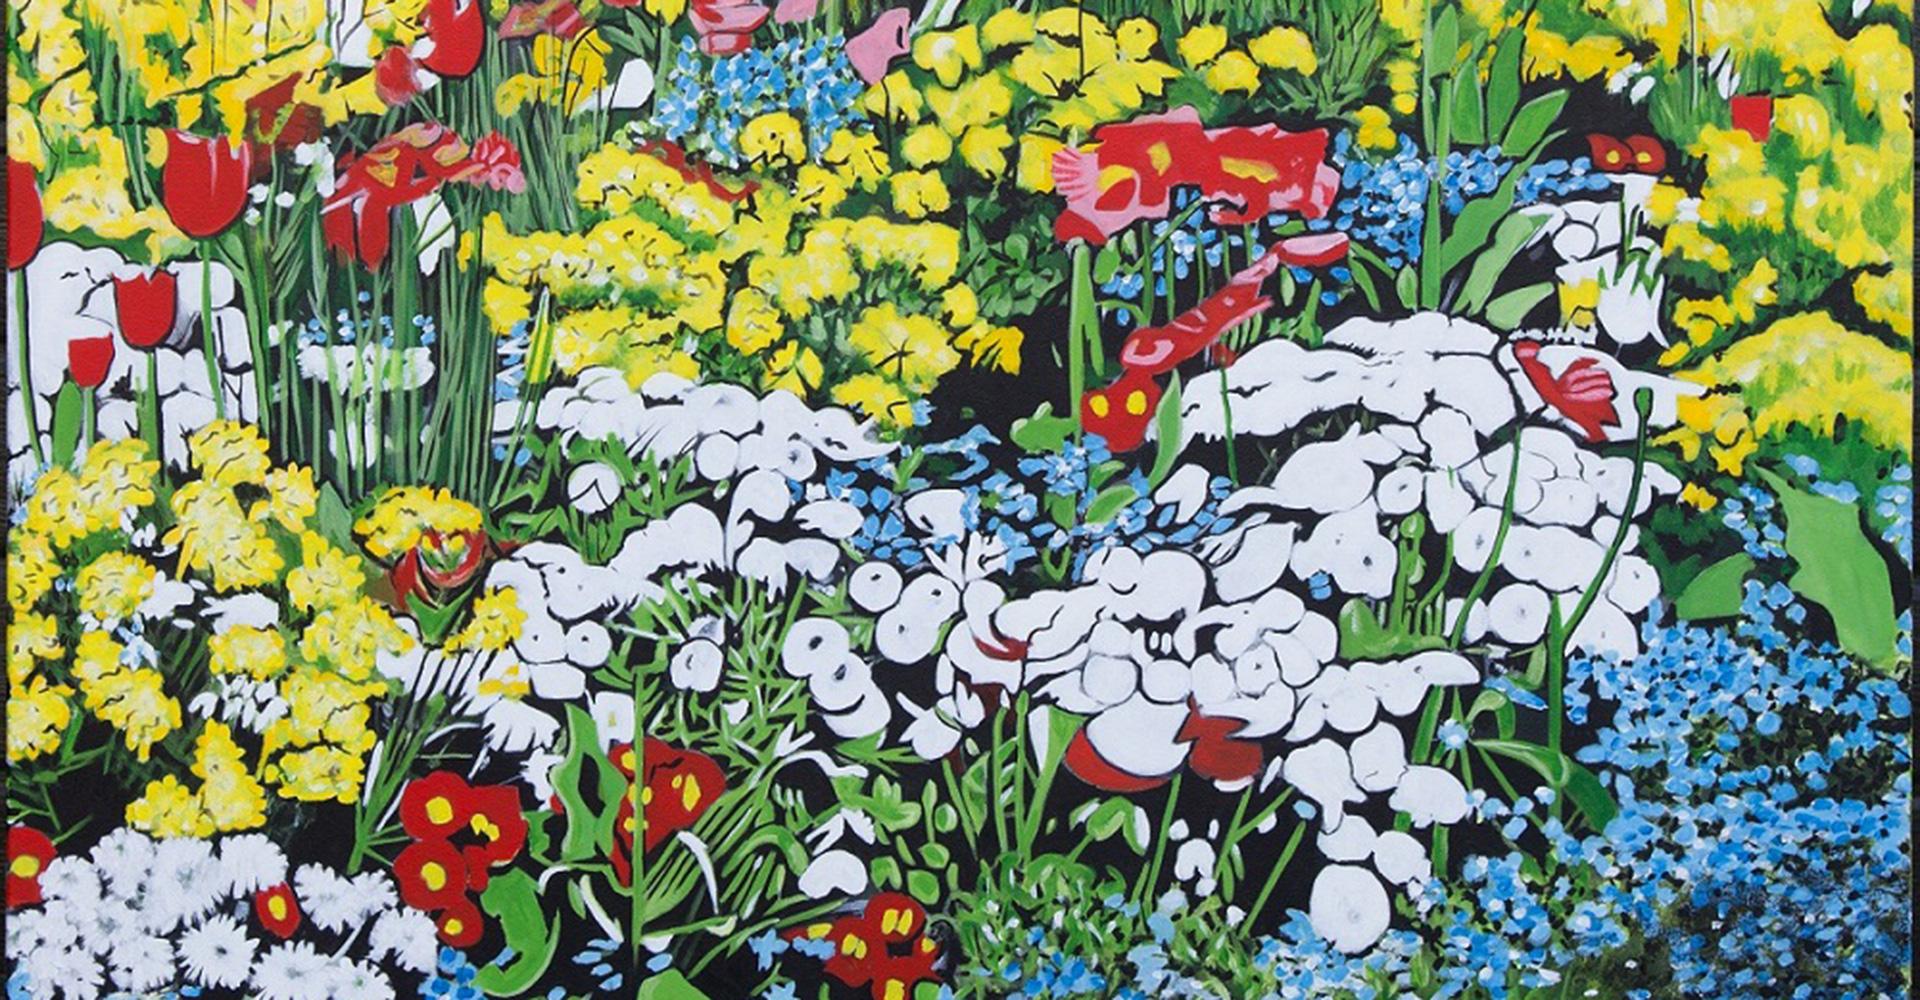 Featured-Image_Spring-Flower-Bed_Richard-Higham-.jpg